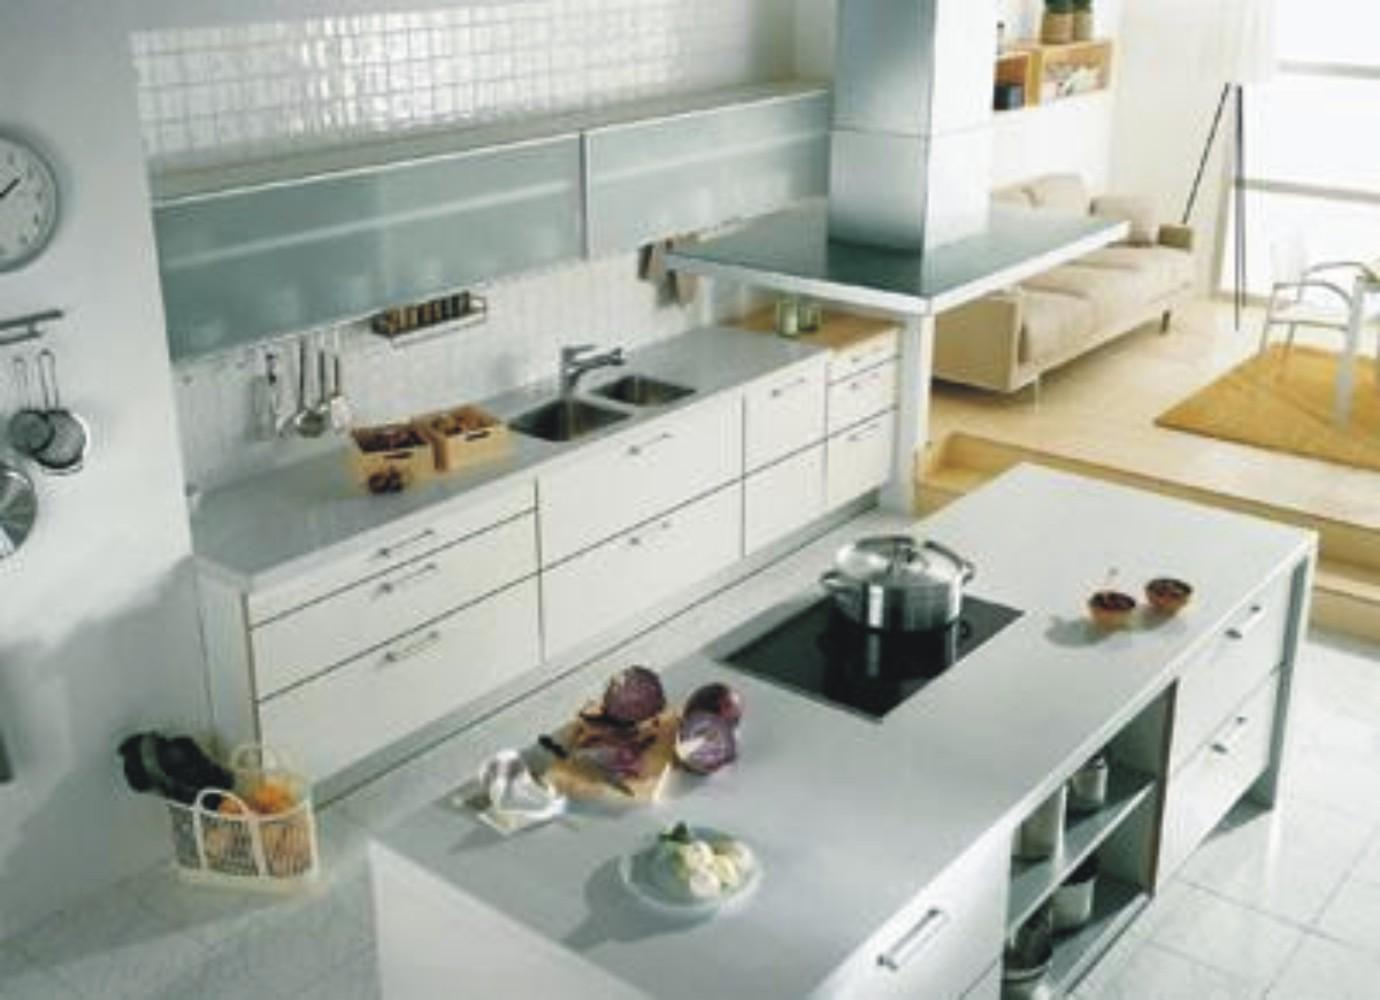 Raquel molina cocinas inspiracion for Muebles tipo isla para cocina